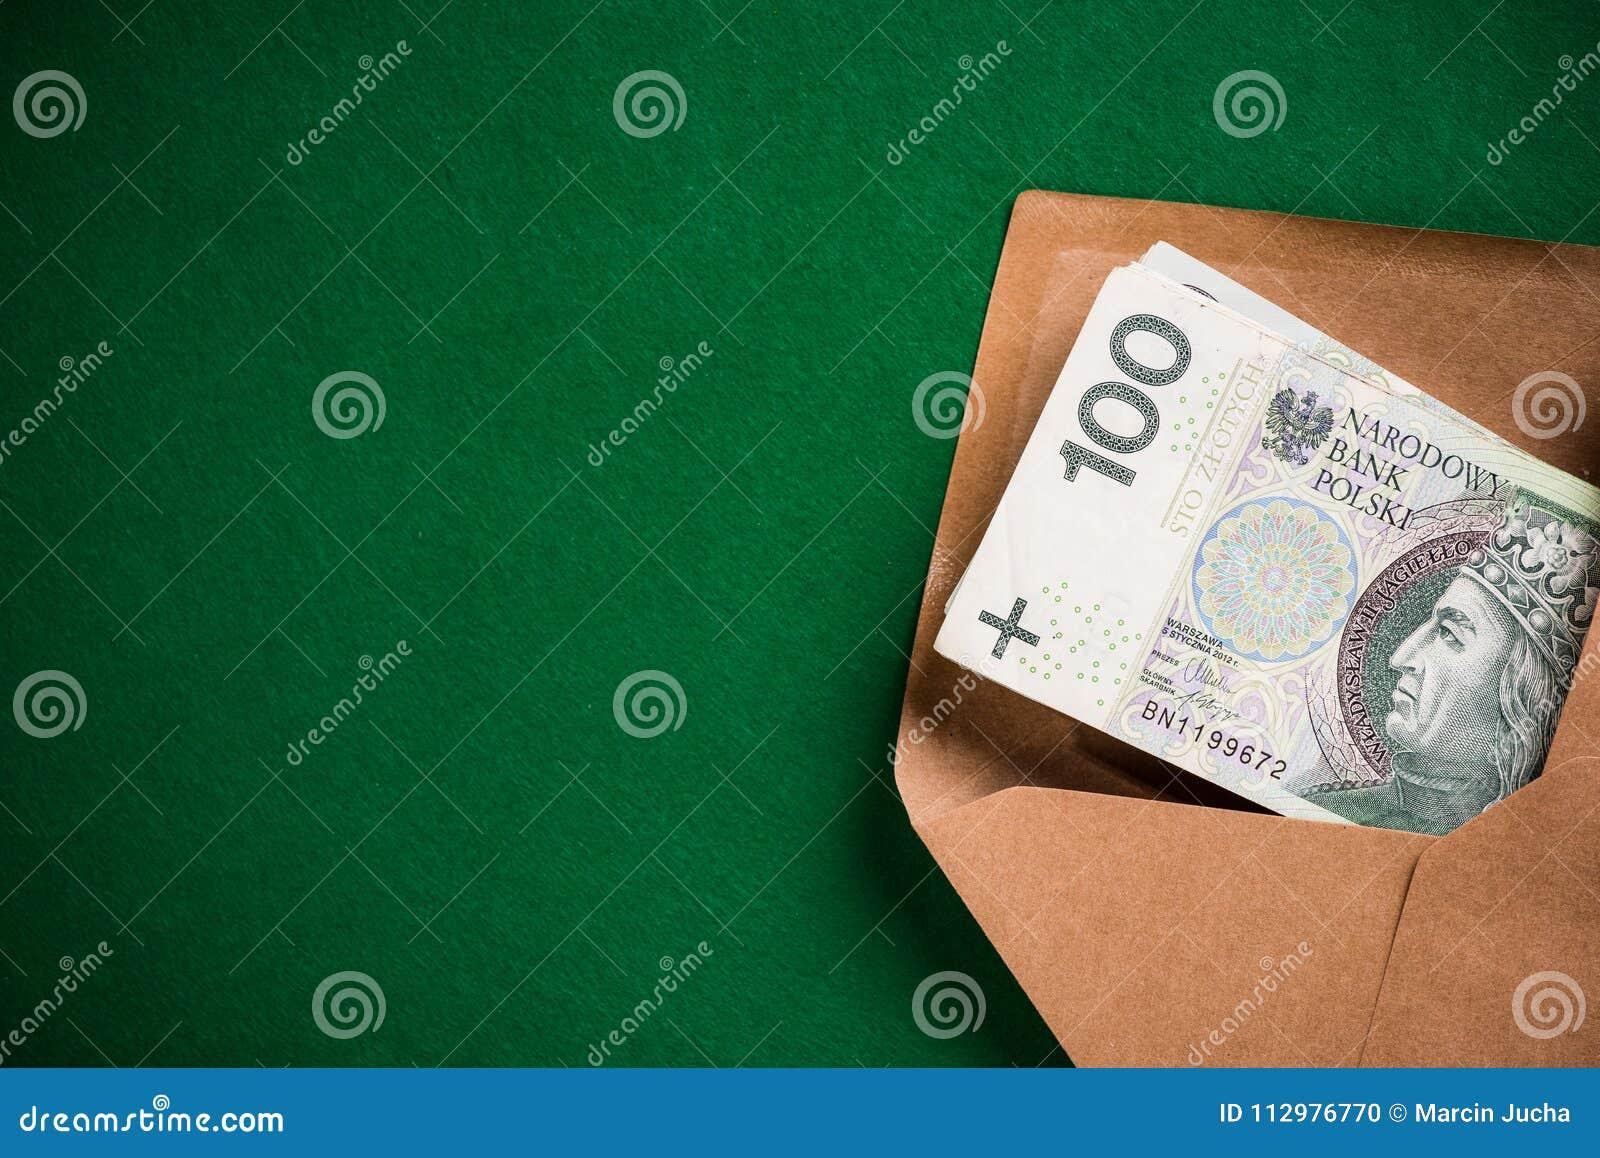 Envelope for dishonest politics,corruption and bribery